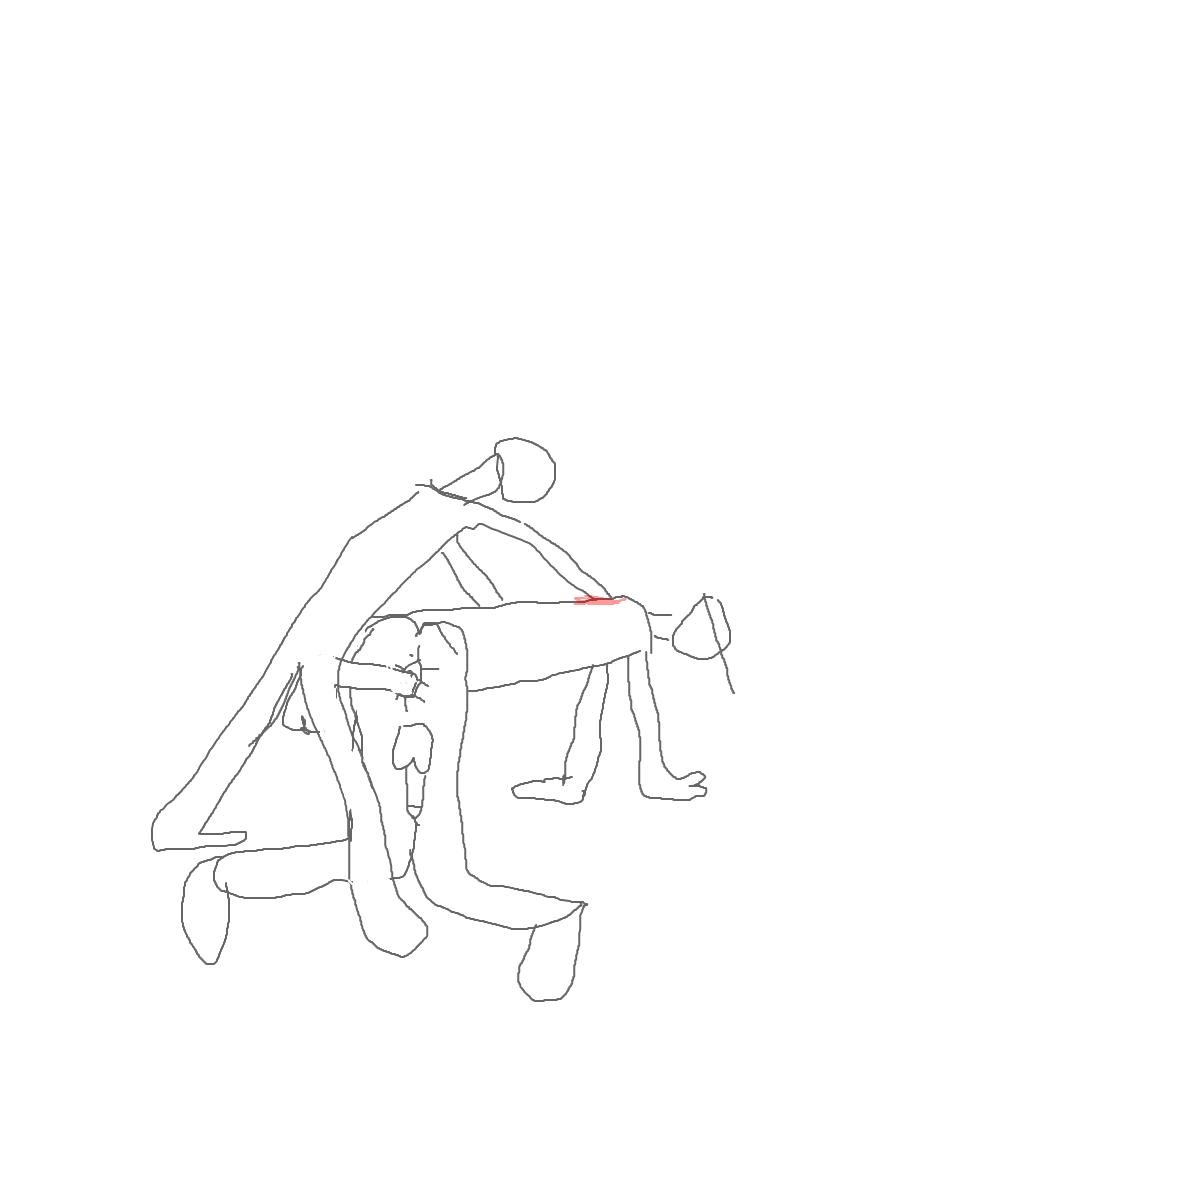 BAAAM drawing#19117 lat:60.3902816772460940lng: 25.6669216156005860